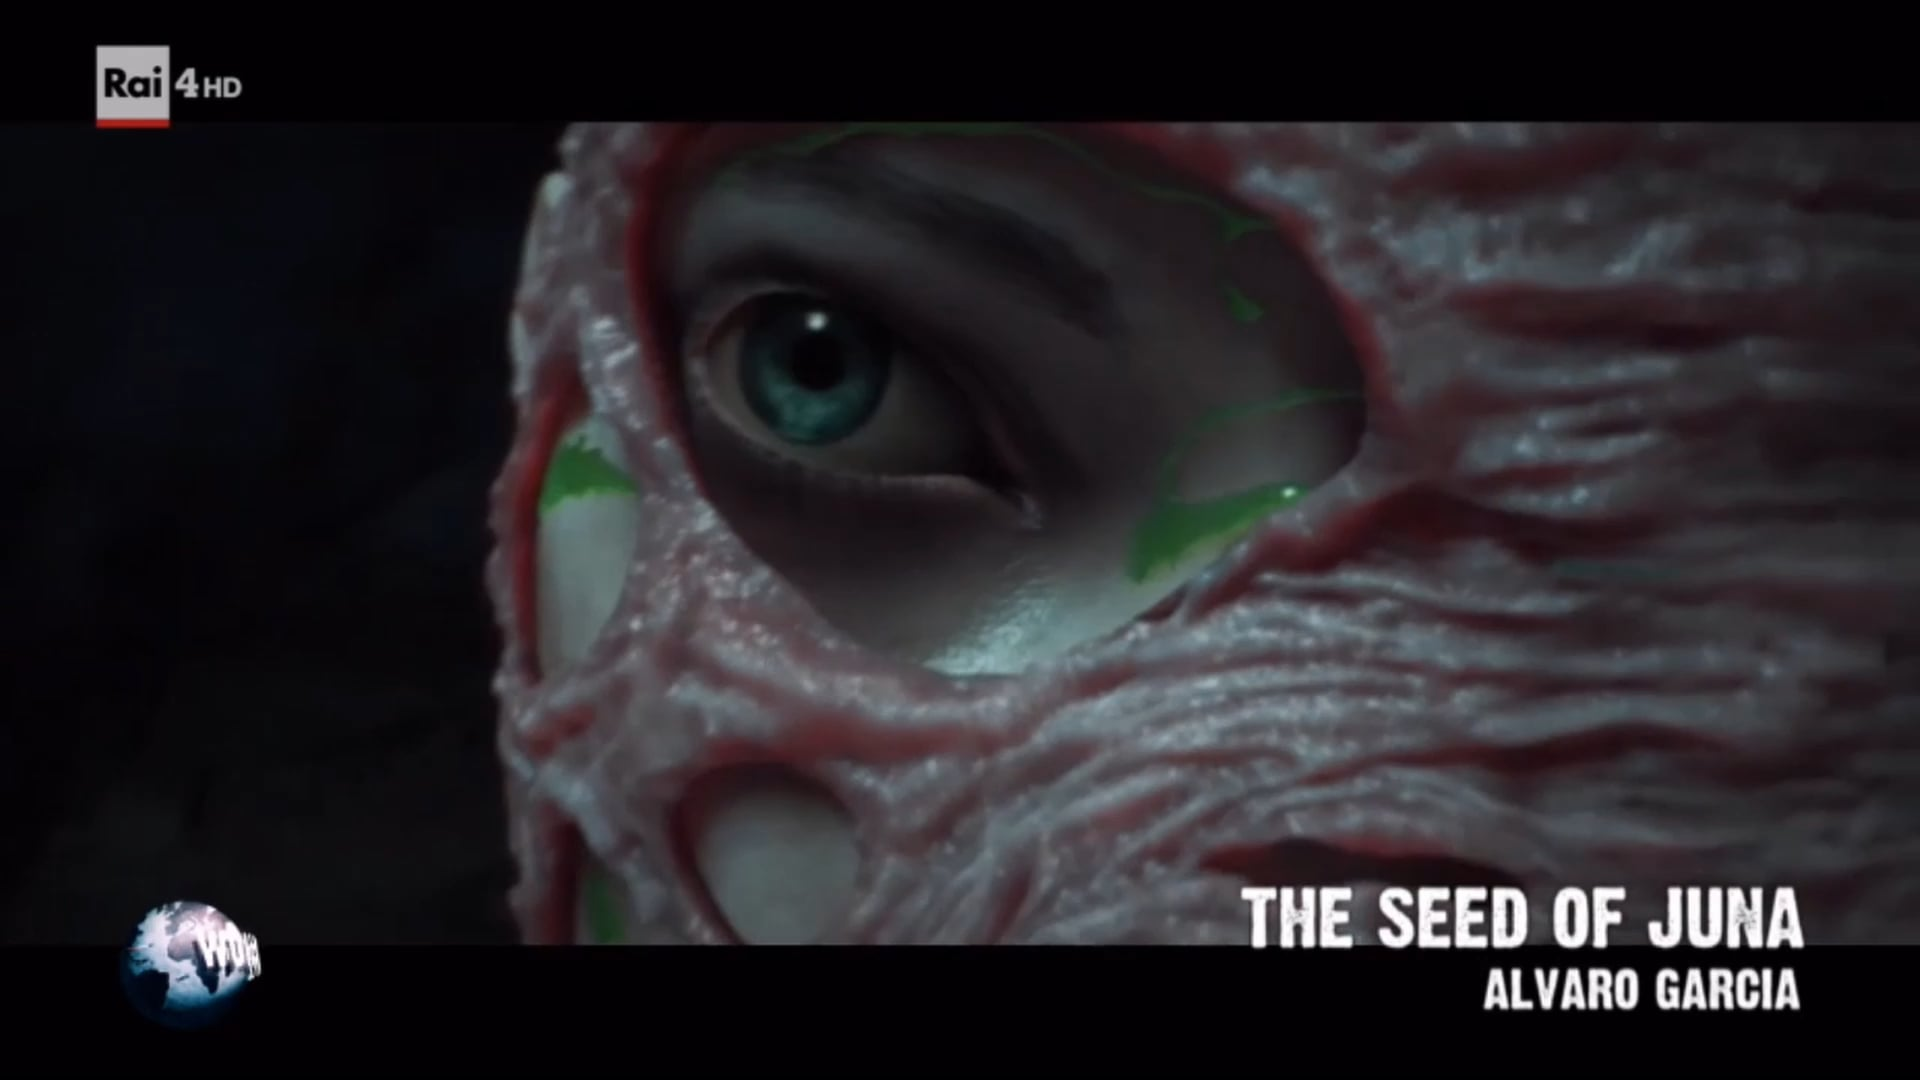 The Seed of Juna - Rai4 (Public Italian TV)